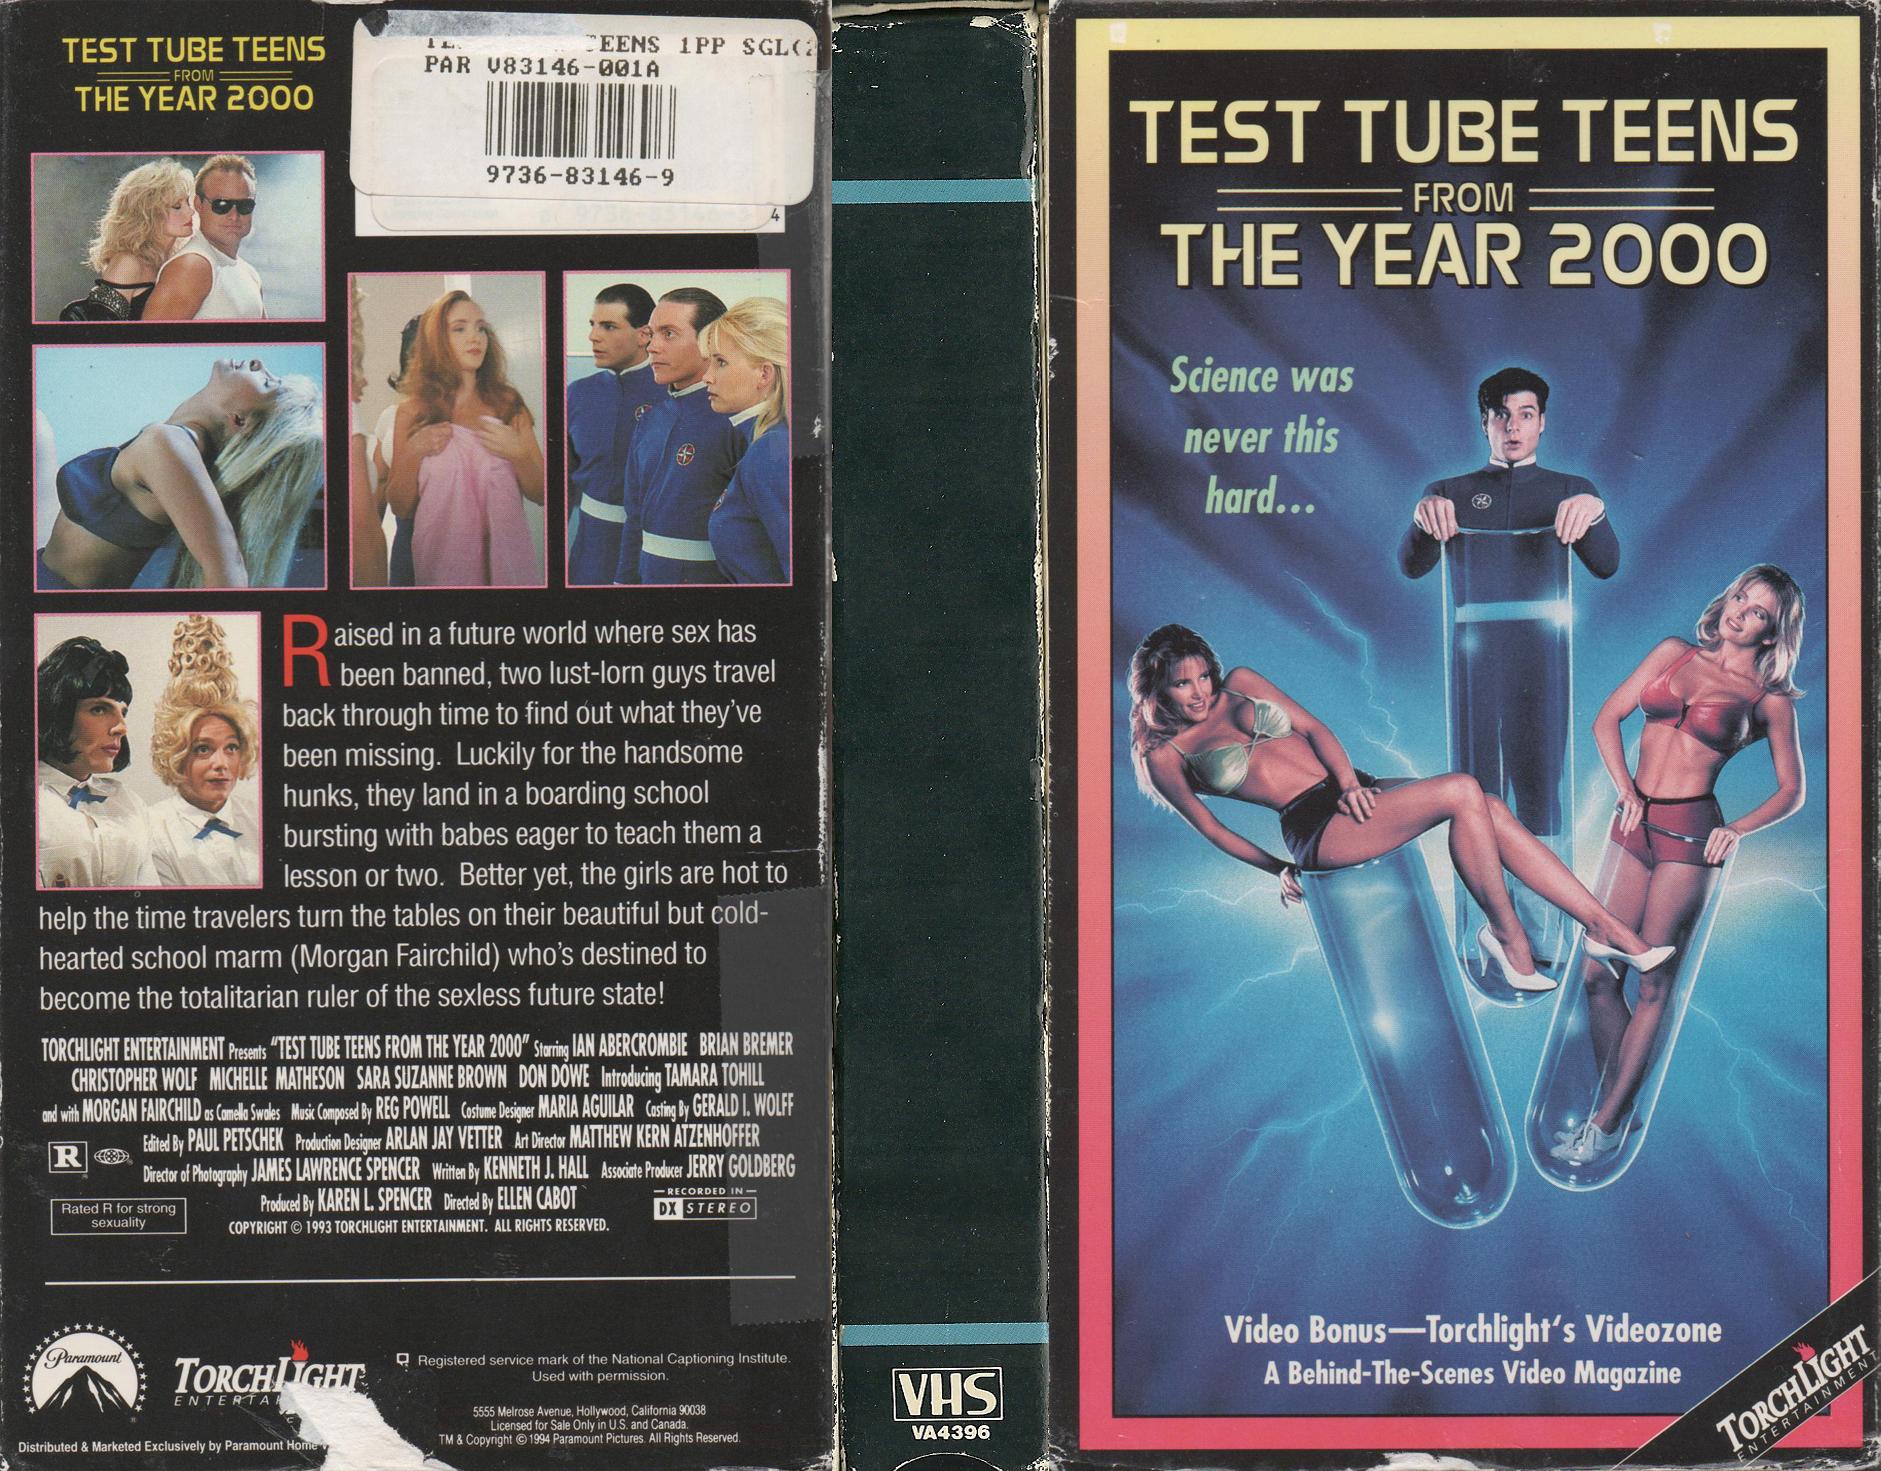 The test tube teen